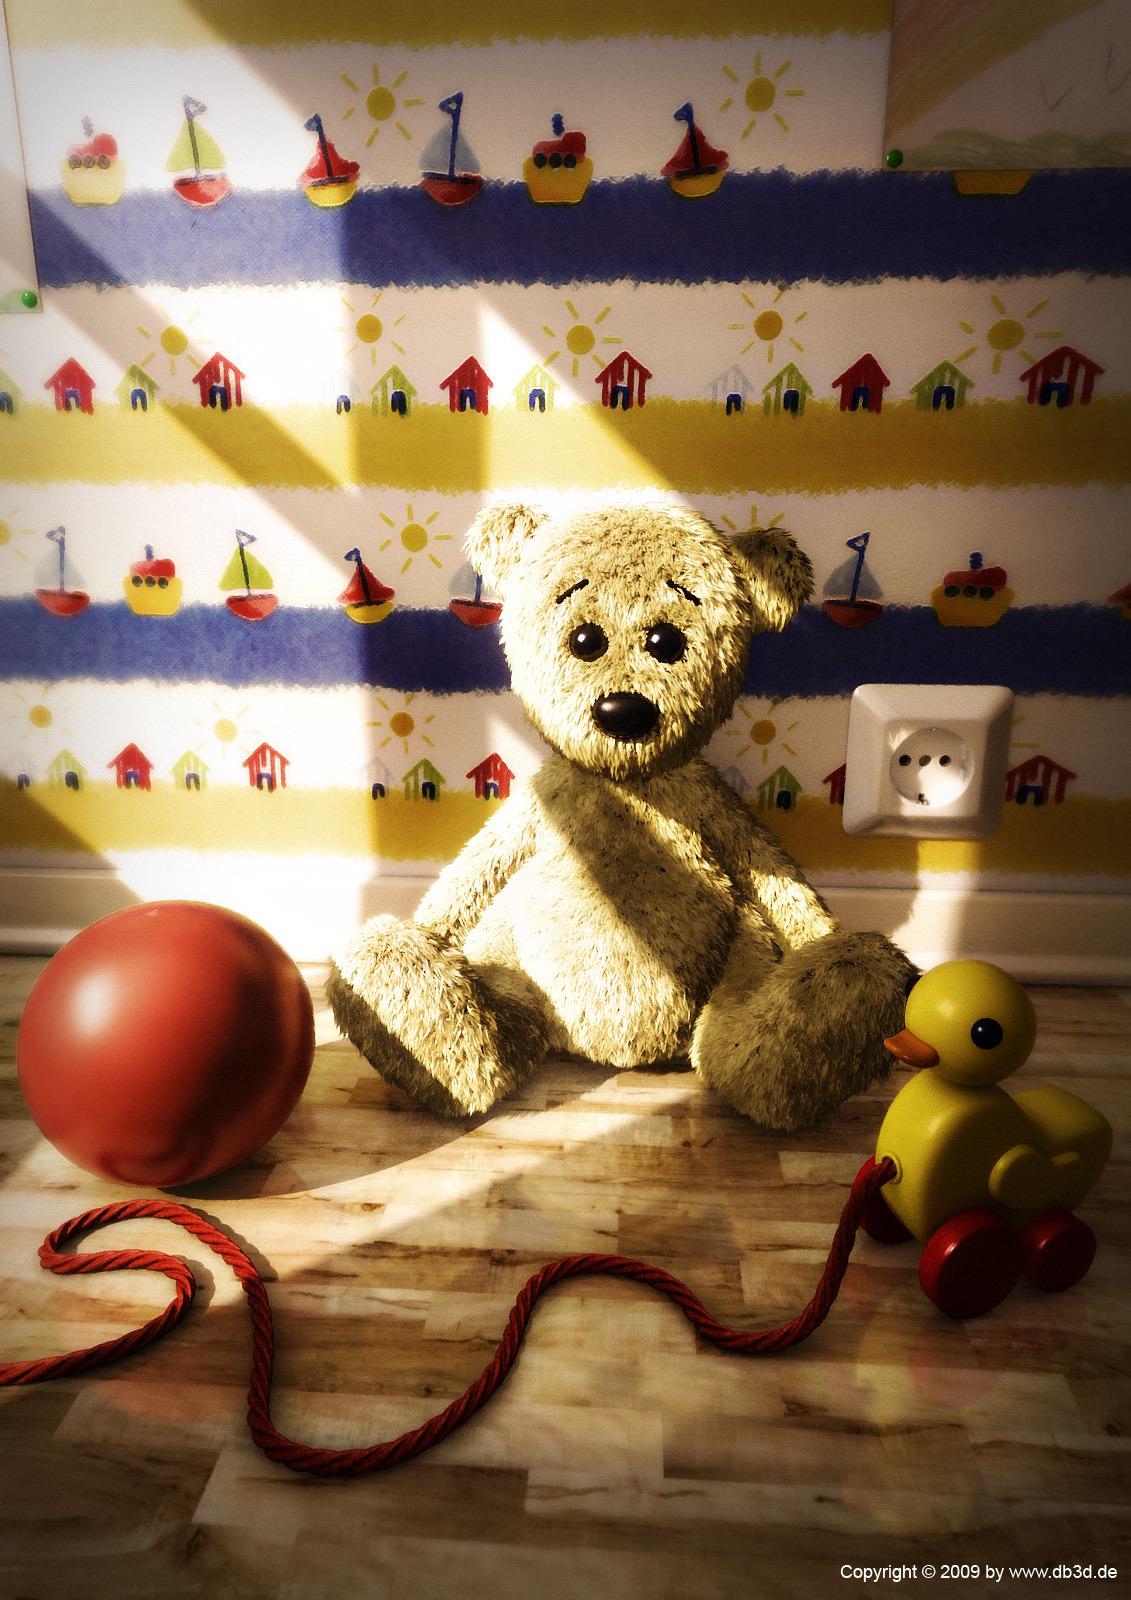 Freebug teddy reloaded 1 3d21a64c nj8u